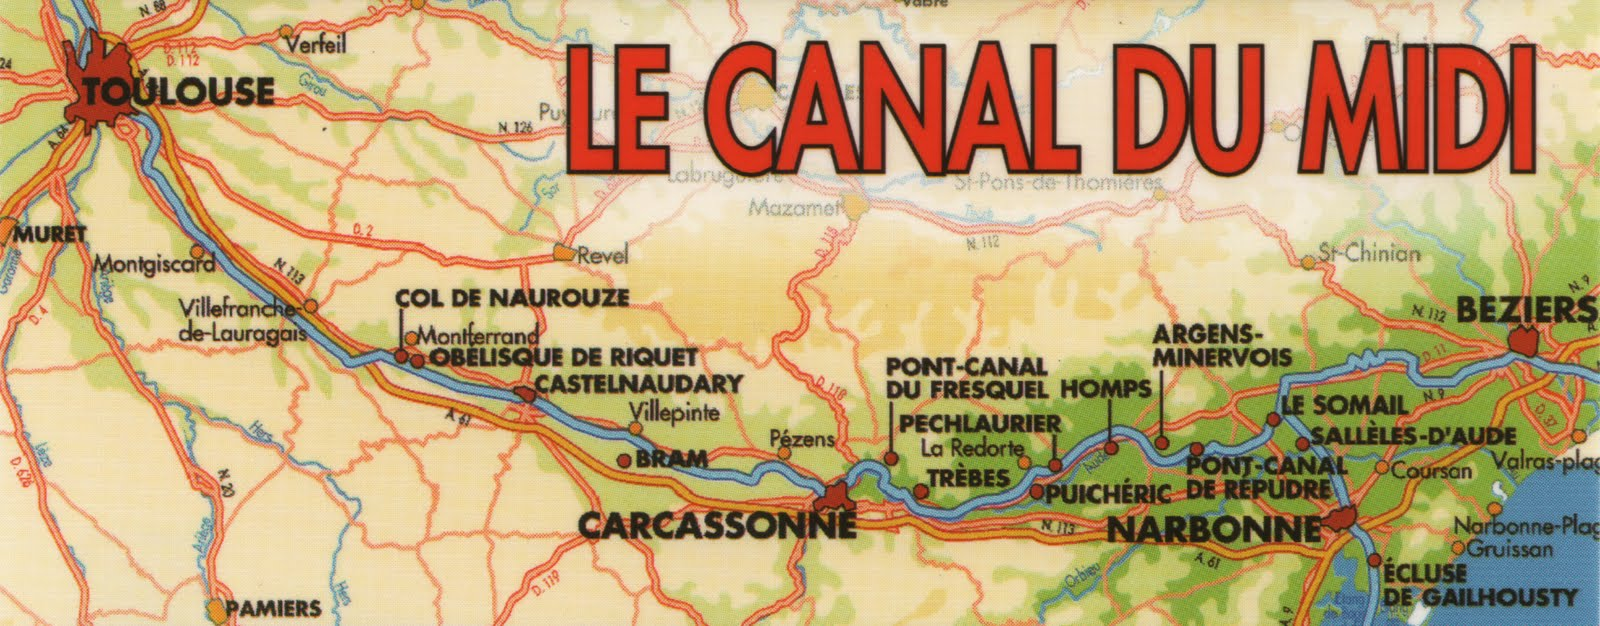 http://3.bp.blogspot.com/_a-Jl_upCAT0/TEB6FZ1TEUI/AAAAAAAABwc/Of7Mw8L_uOc/s1600/Canal_du_Midi-Map.jpg